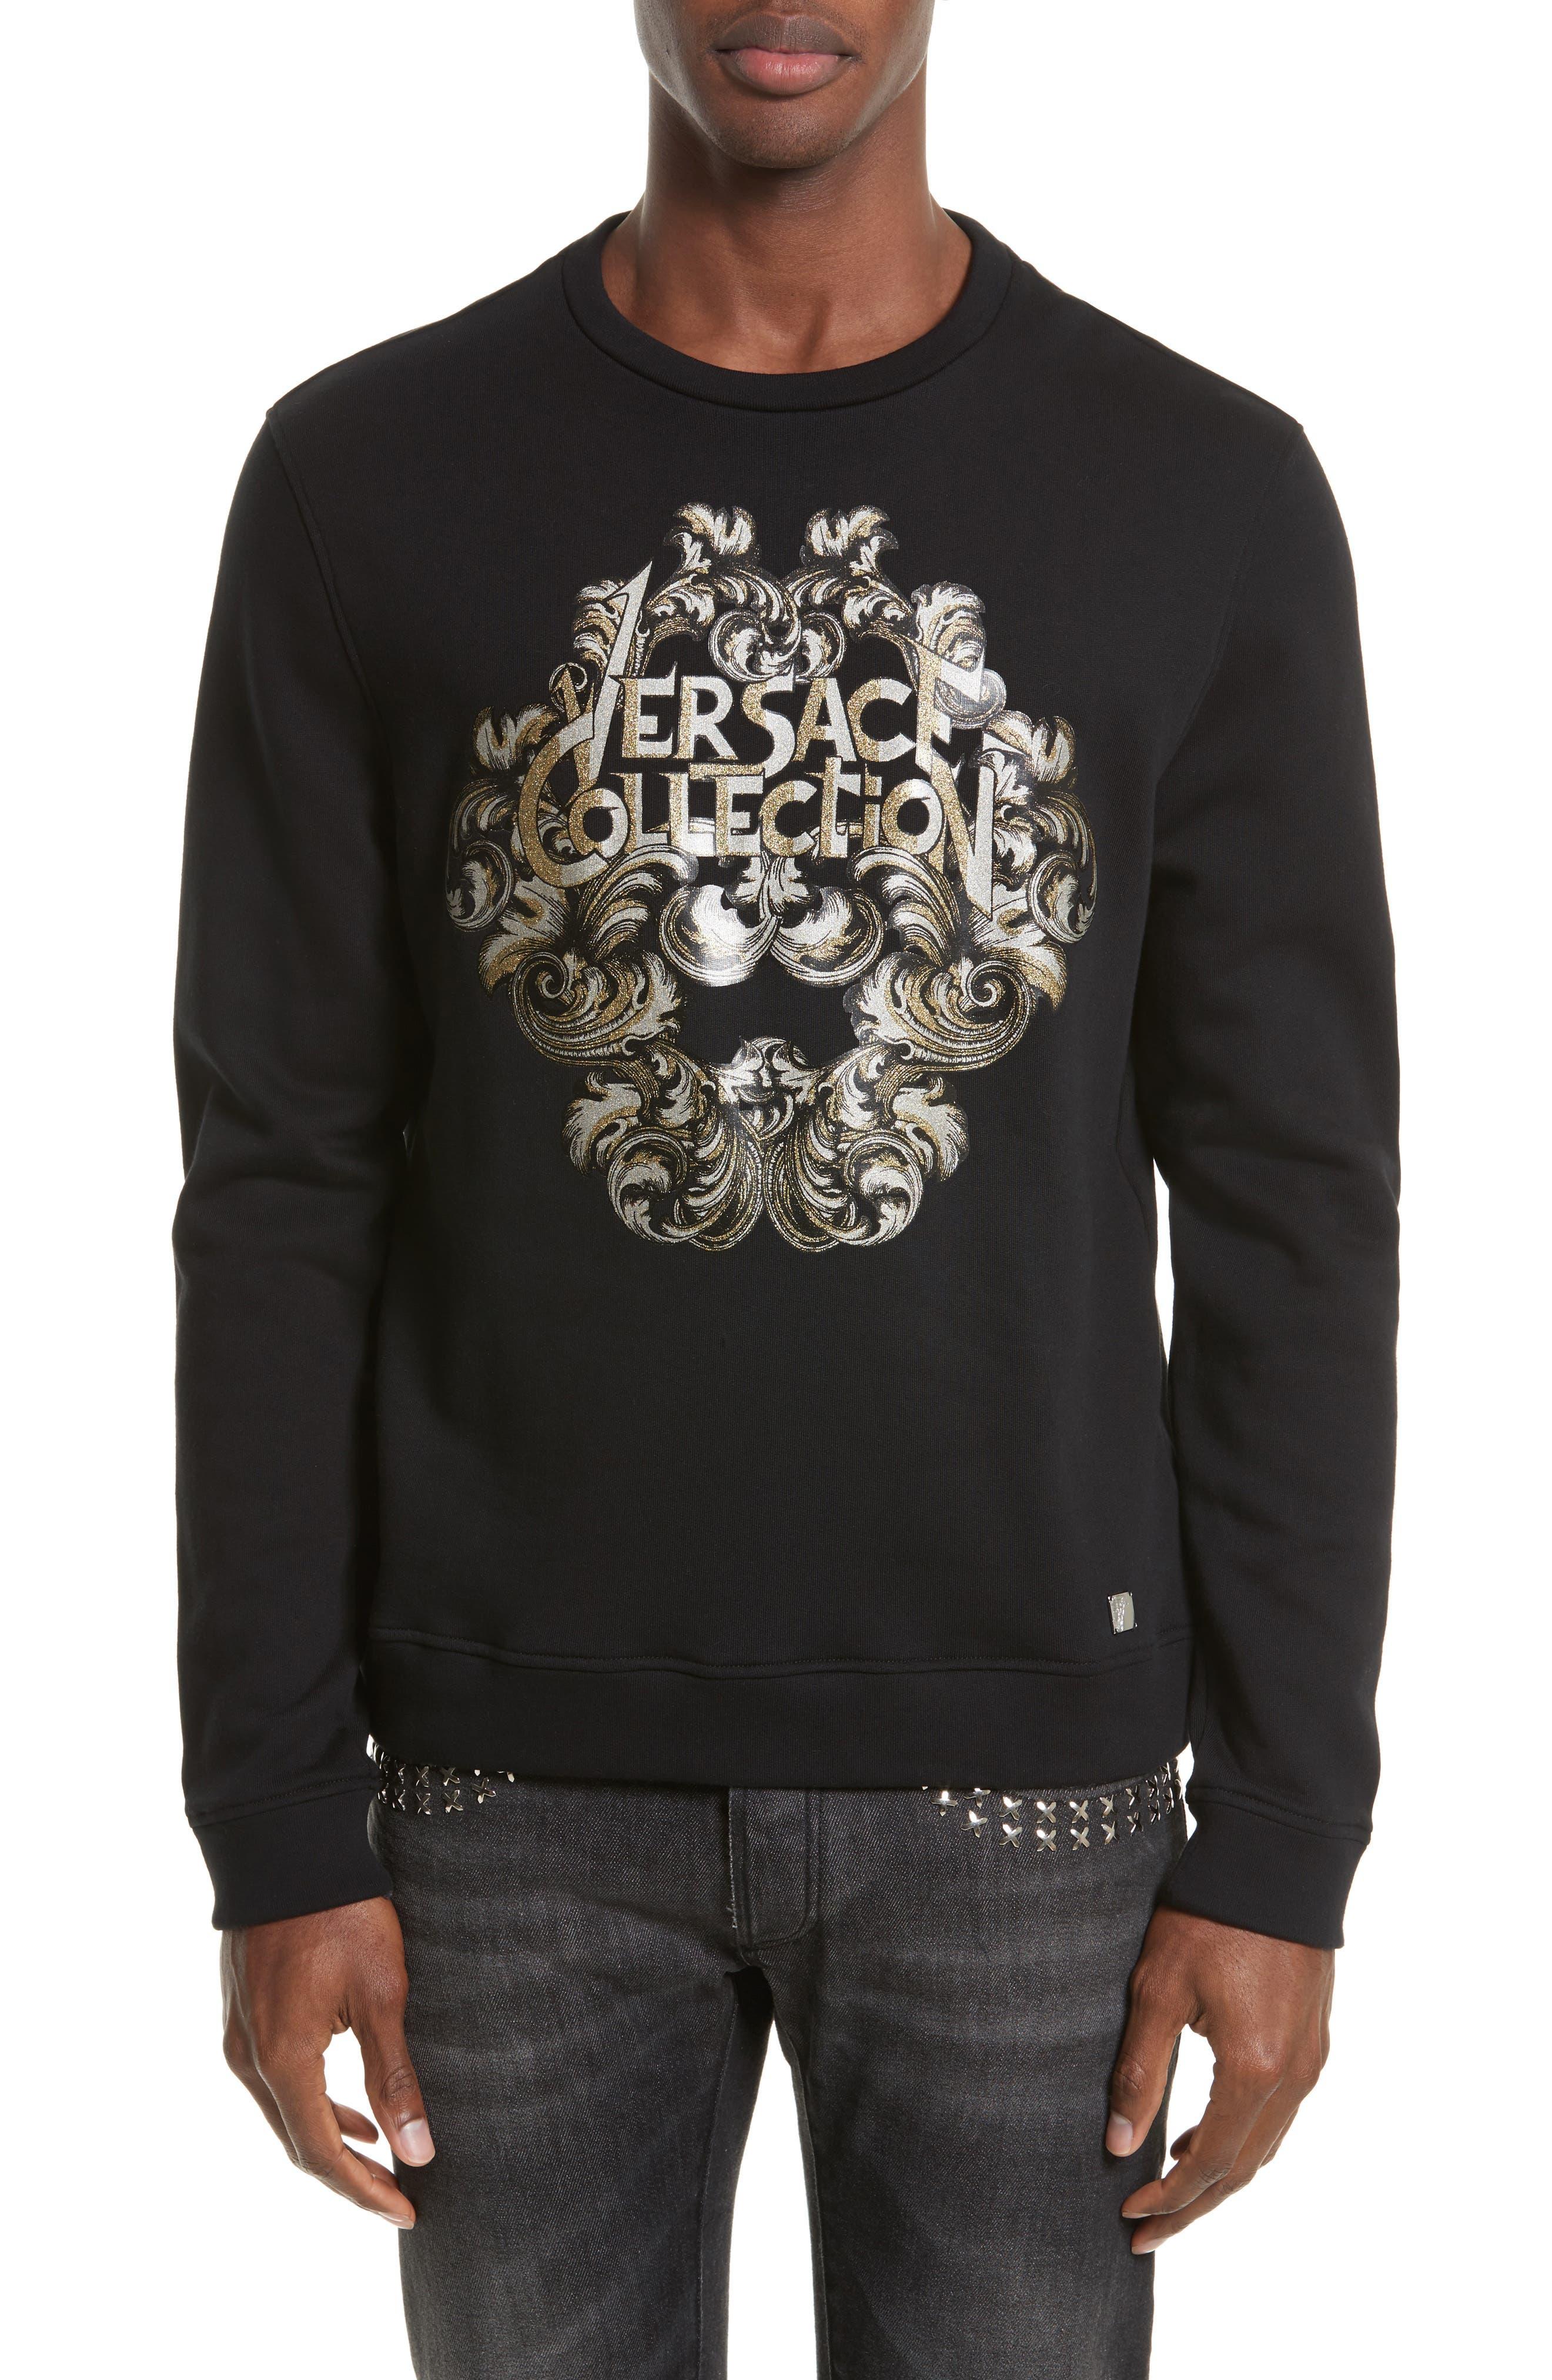 Versace Collection Corinthian Logo Graphic Sweatshirt